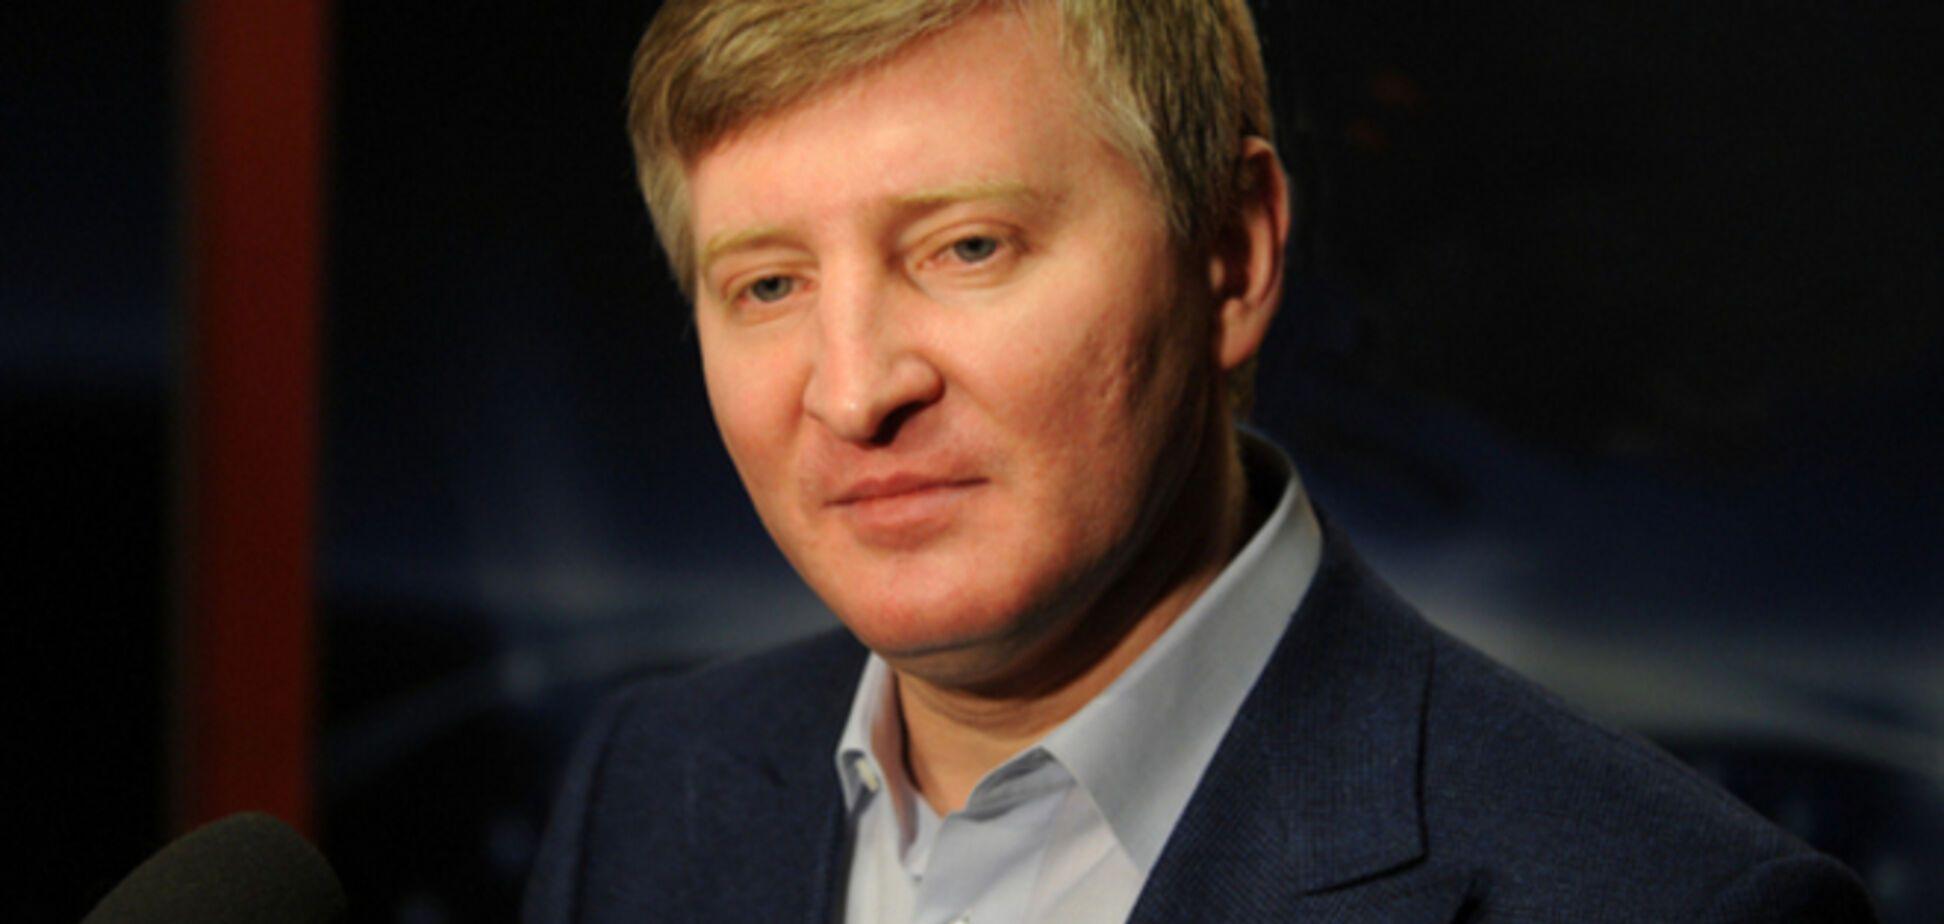 Самопровозглашенная 'ДНР' ждет признания и денег от Ахметова